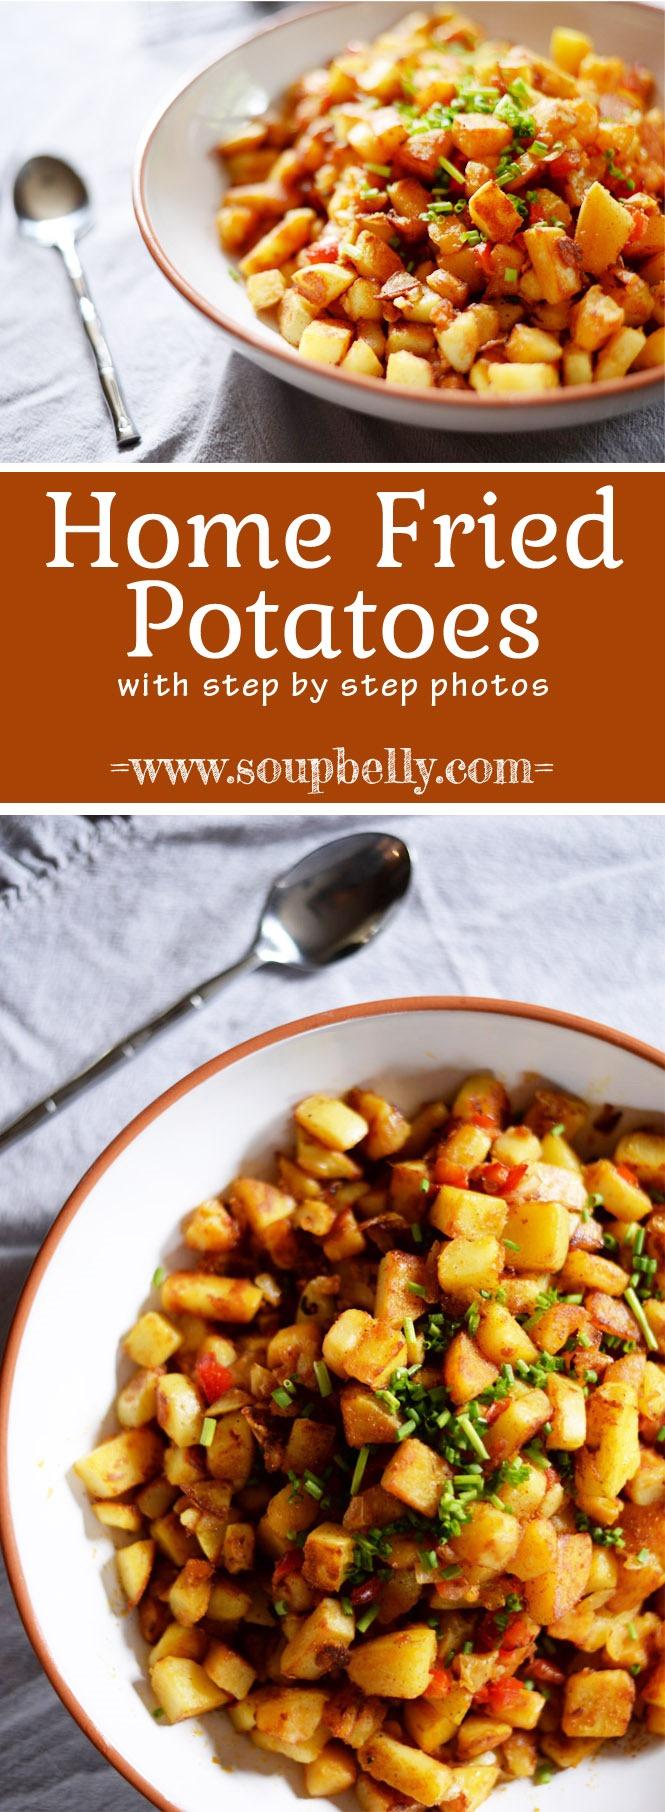 potatoespin